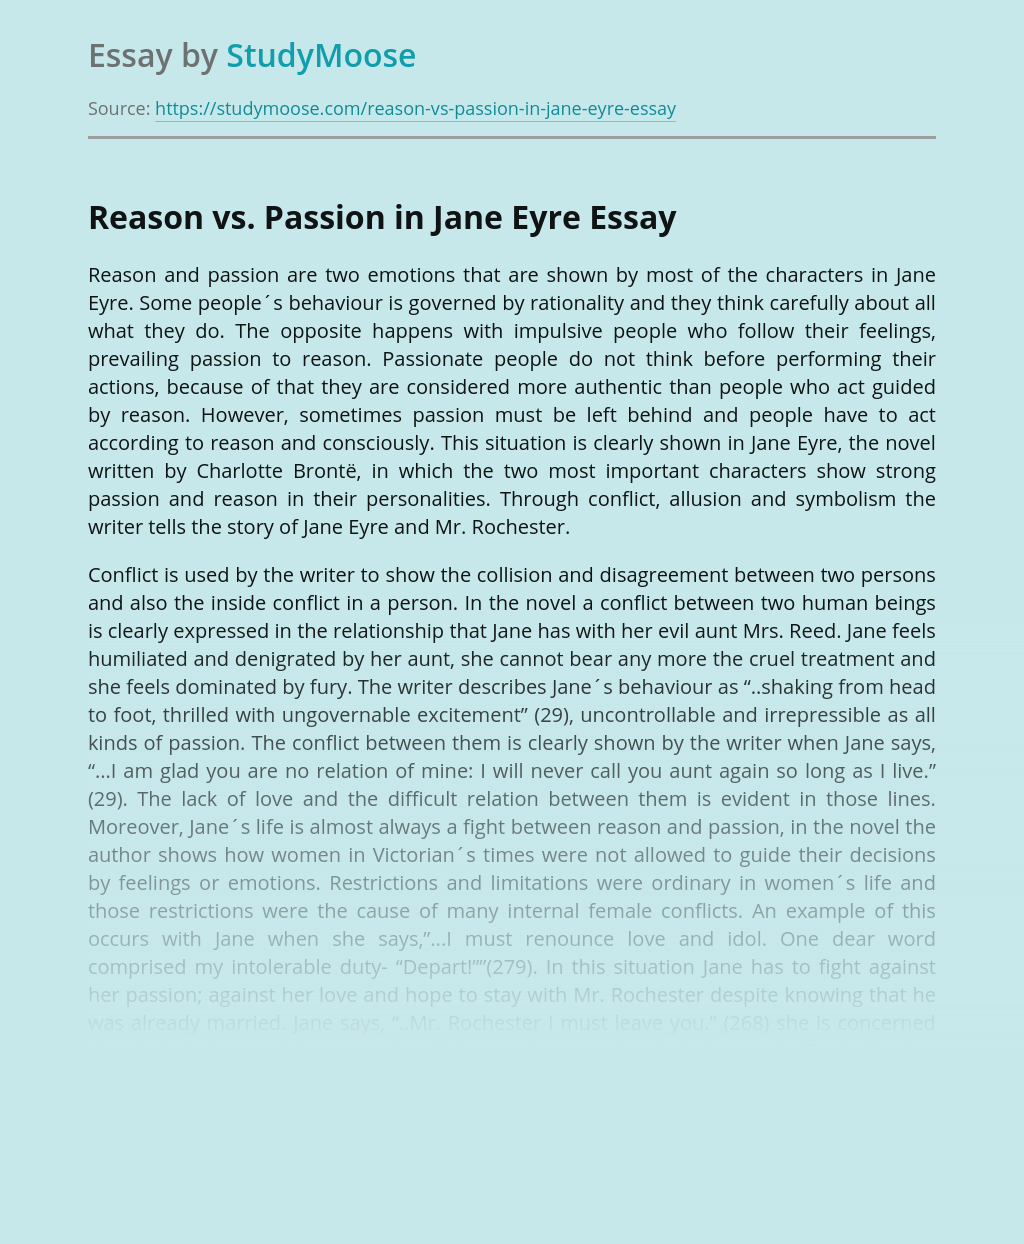 Reason vs. Passion in Jane Eyre